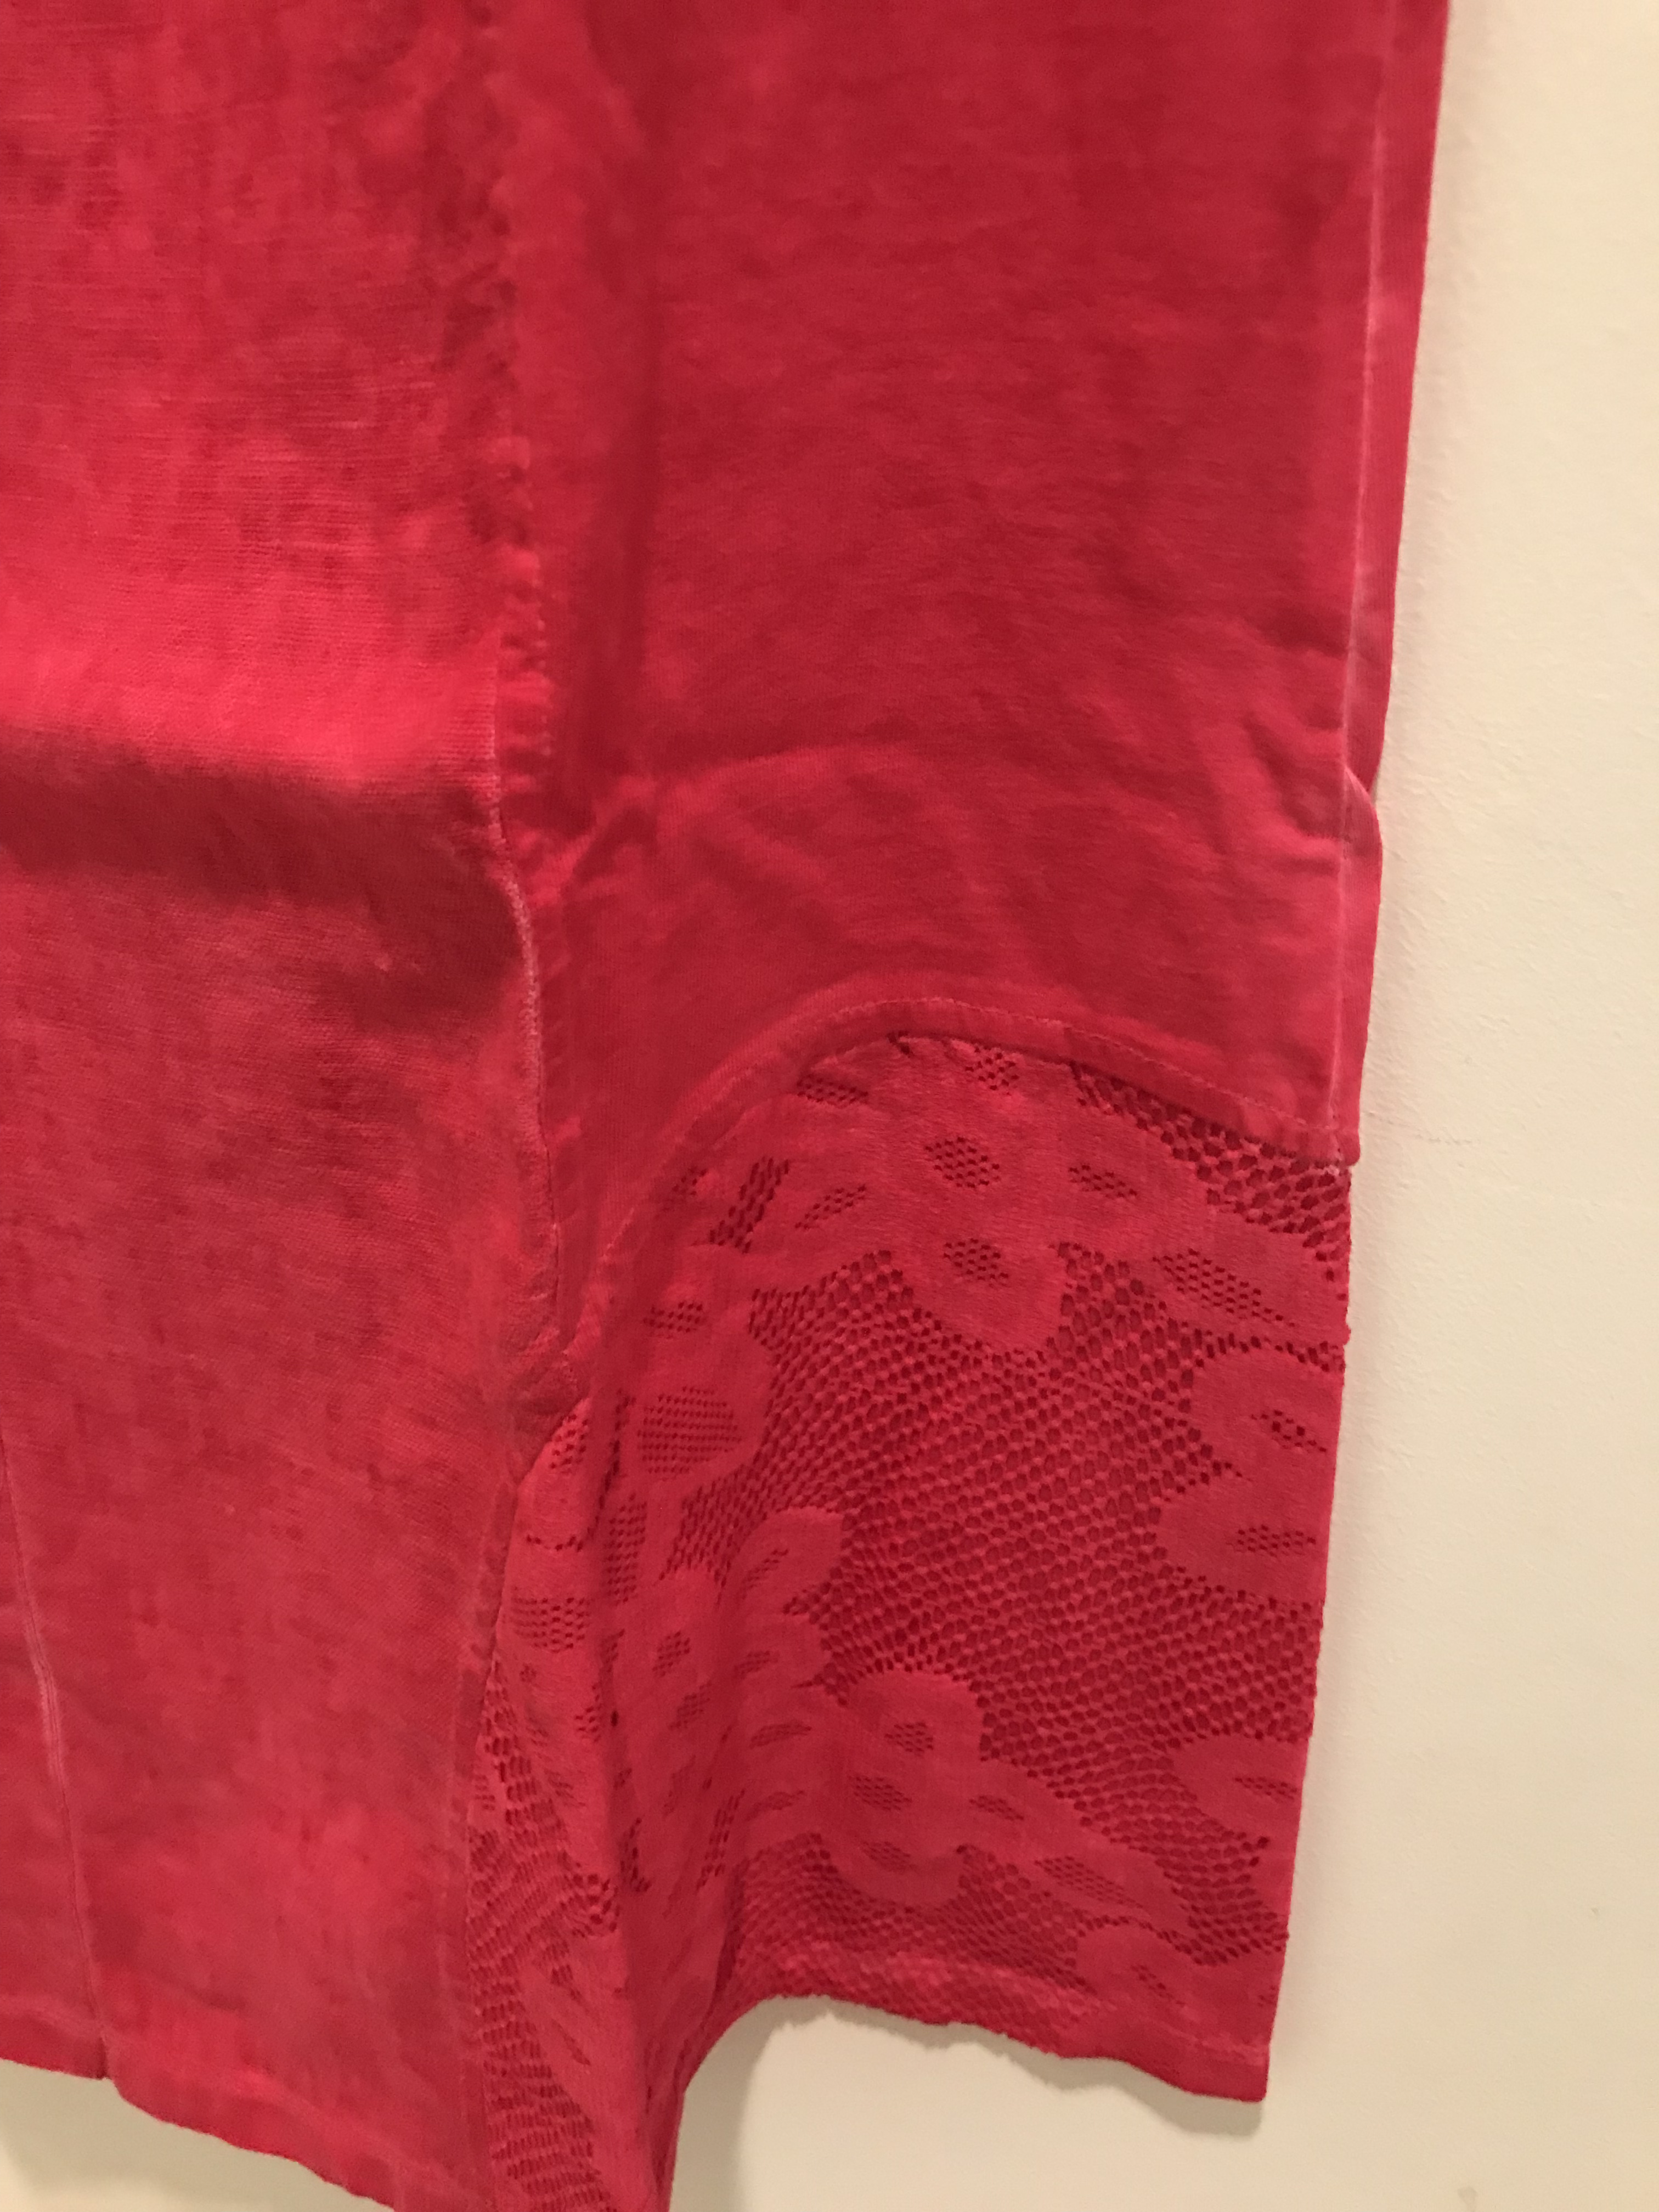 Maloka: Cutout Shoulder Princess Seam Linen Stretch Dress (1 left in Fuschia!)